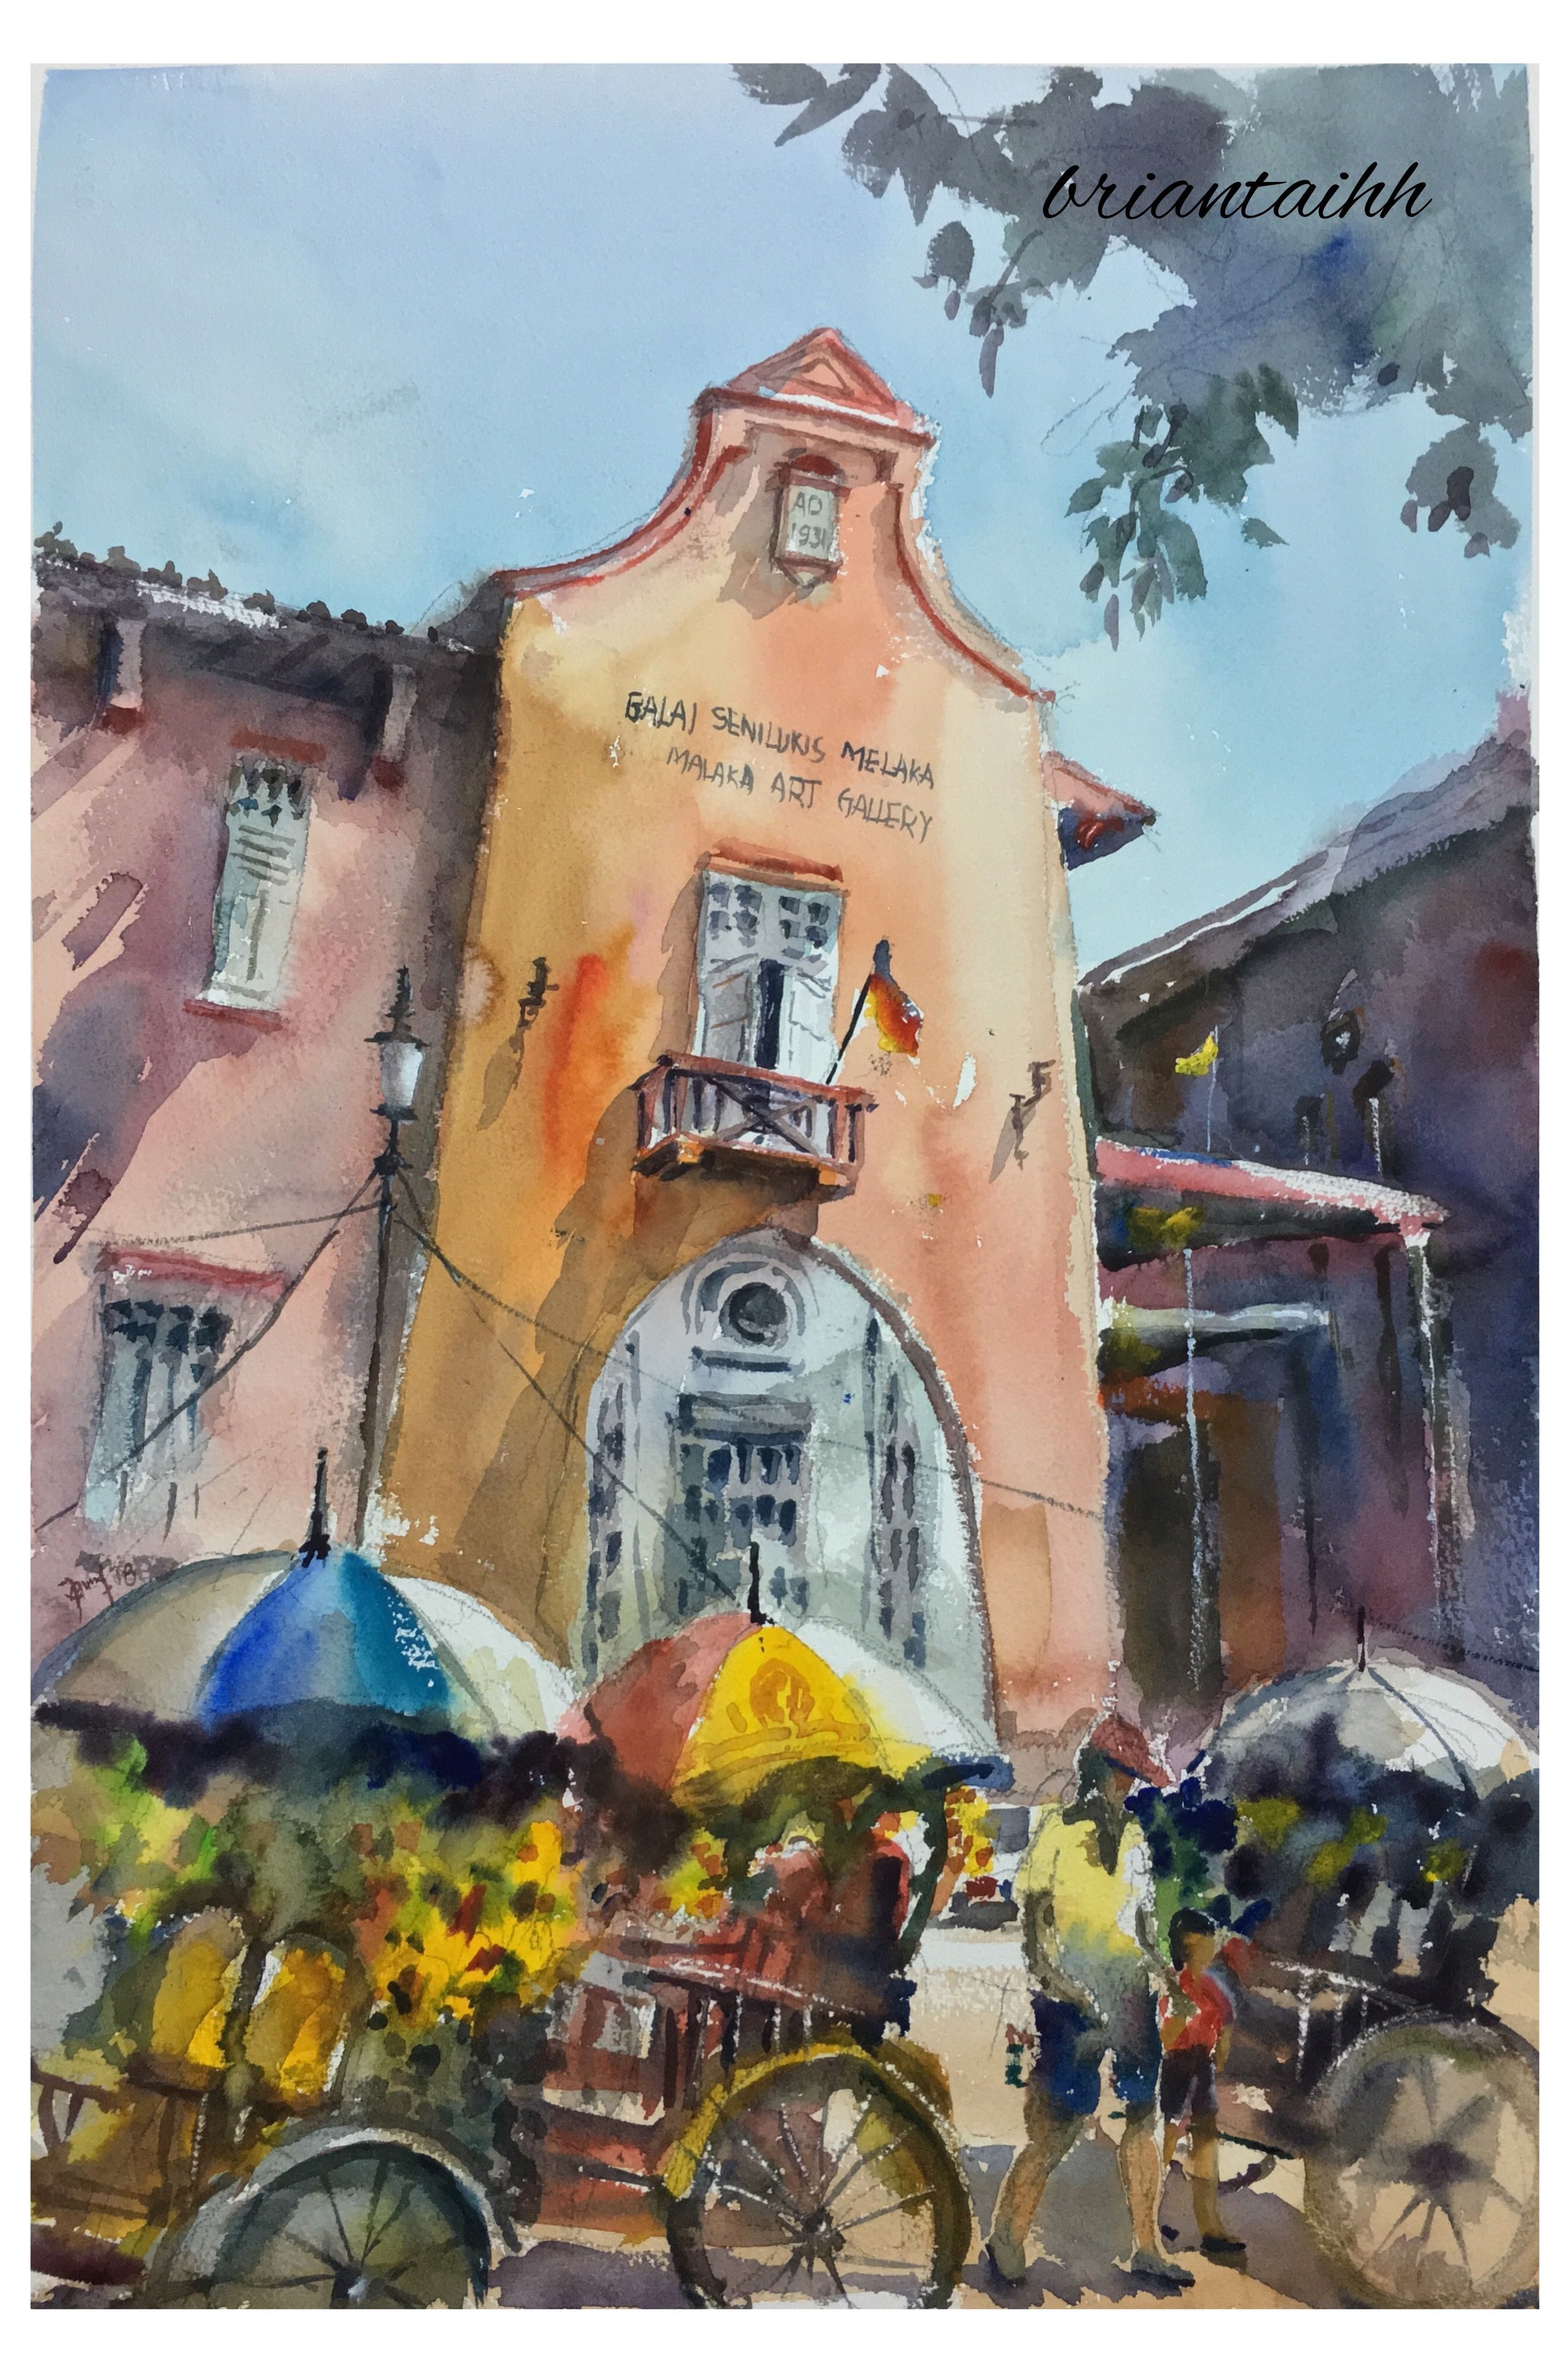 Malacca Art Gallery Watercolour By Brian Tai Art Painting